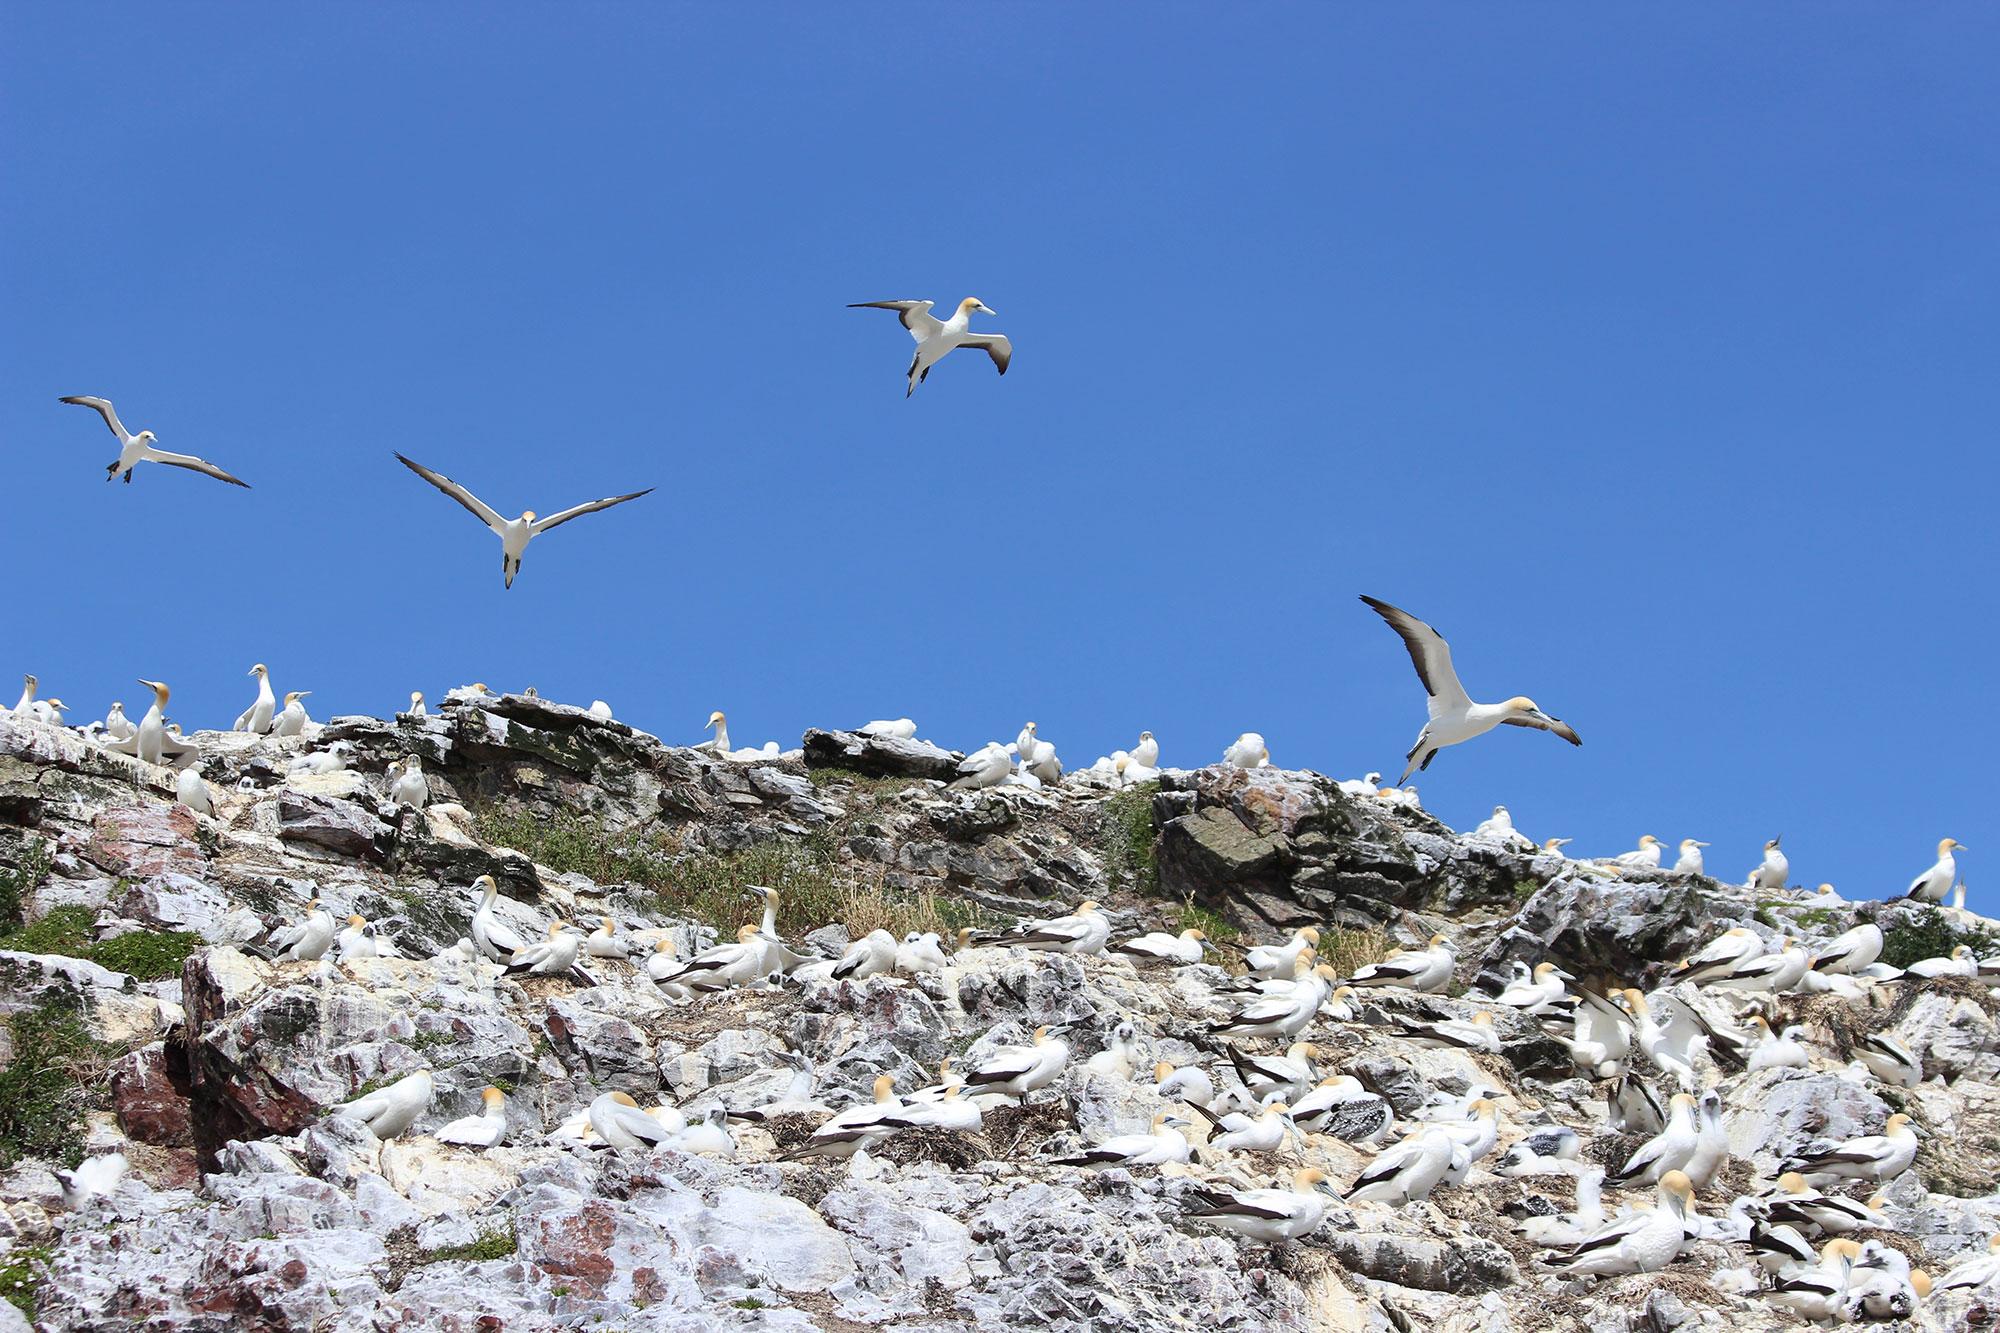 Gannets at Gannet Rock/Horu horu island